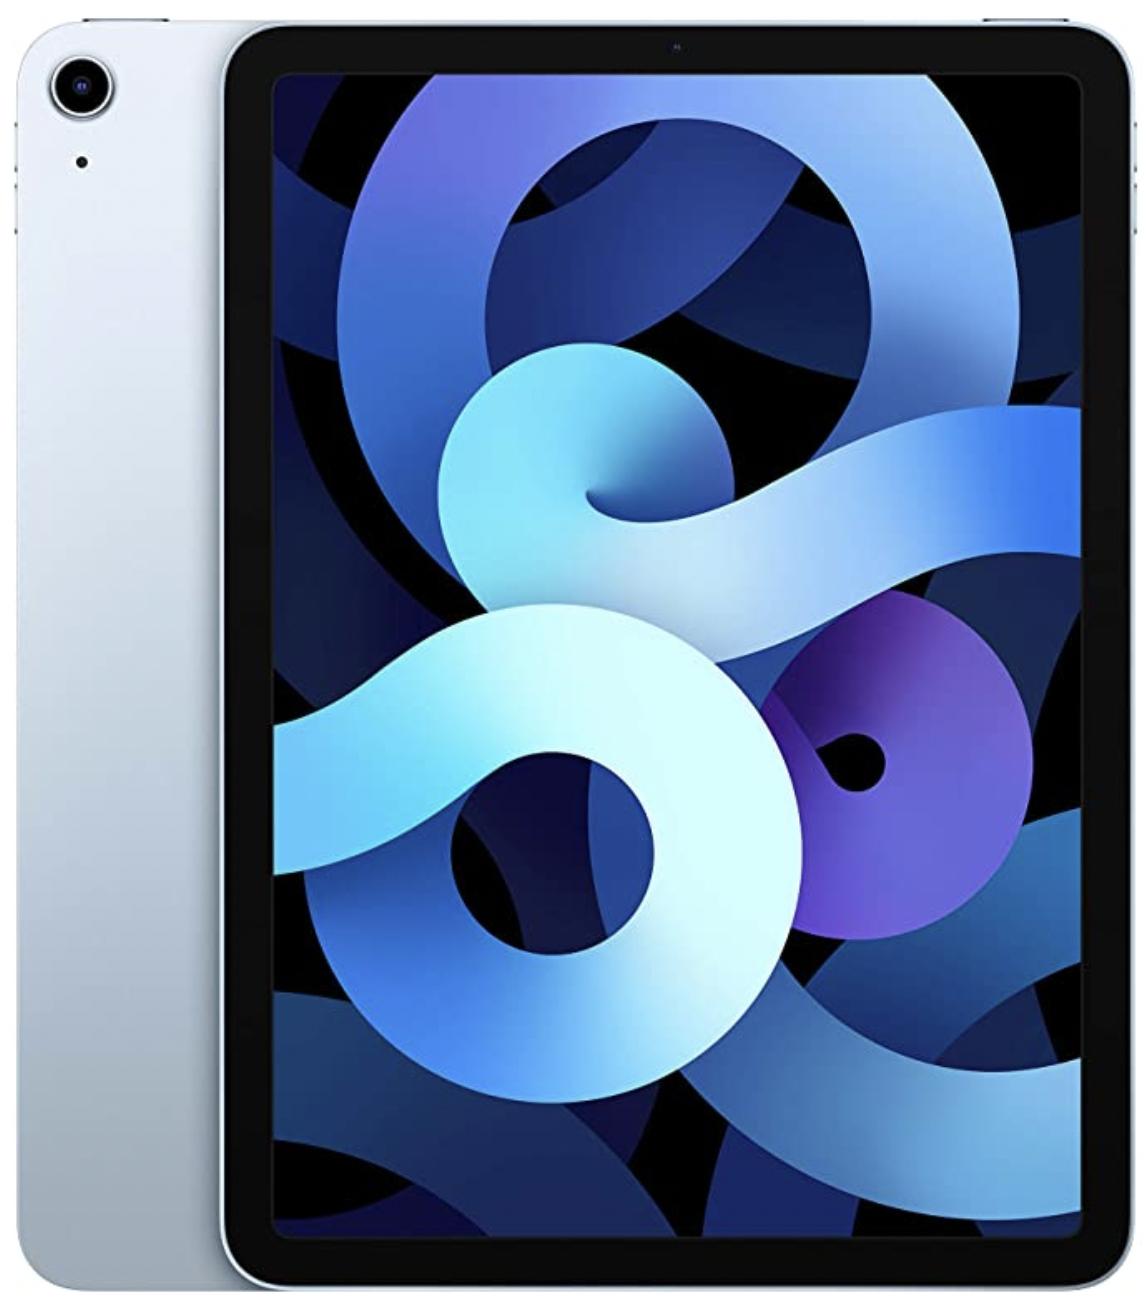 iPad Air 4th generation, 256gb model in blue (not 64gb) - £649.97 @ Amazon